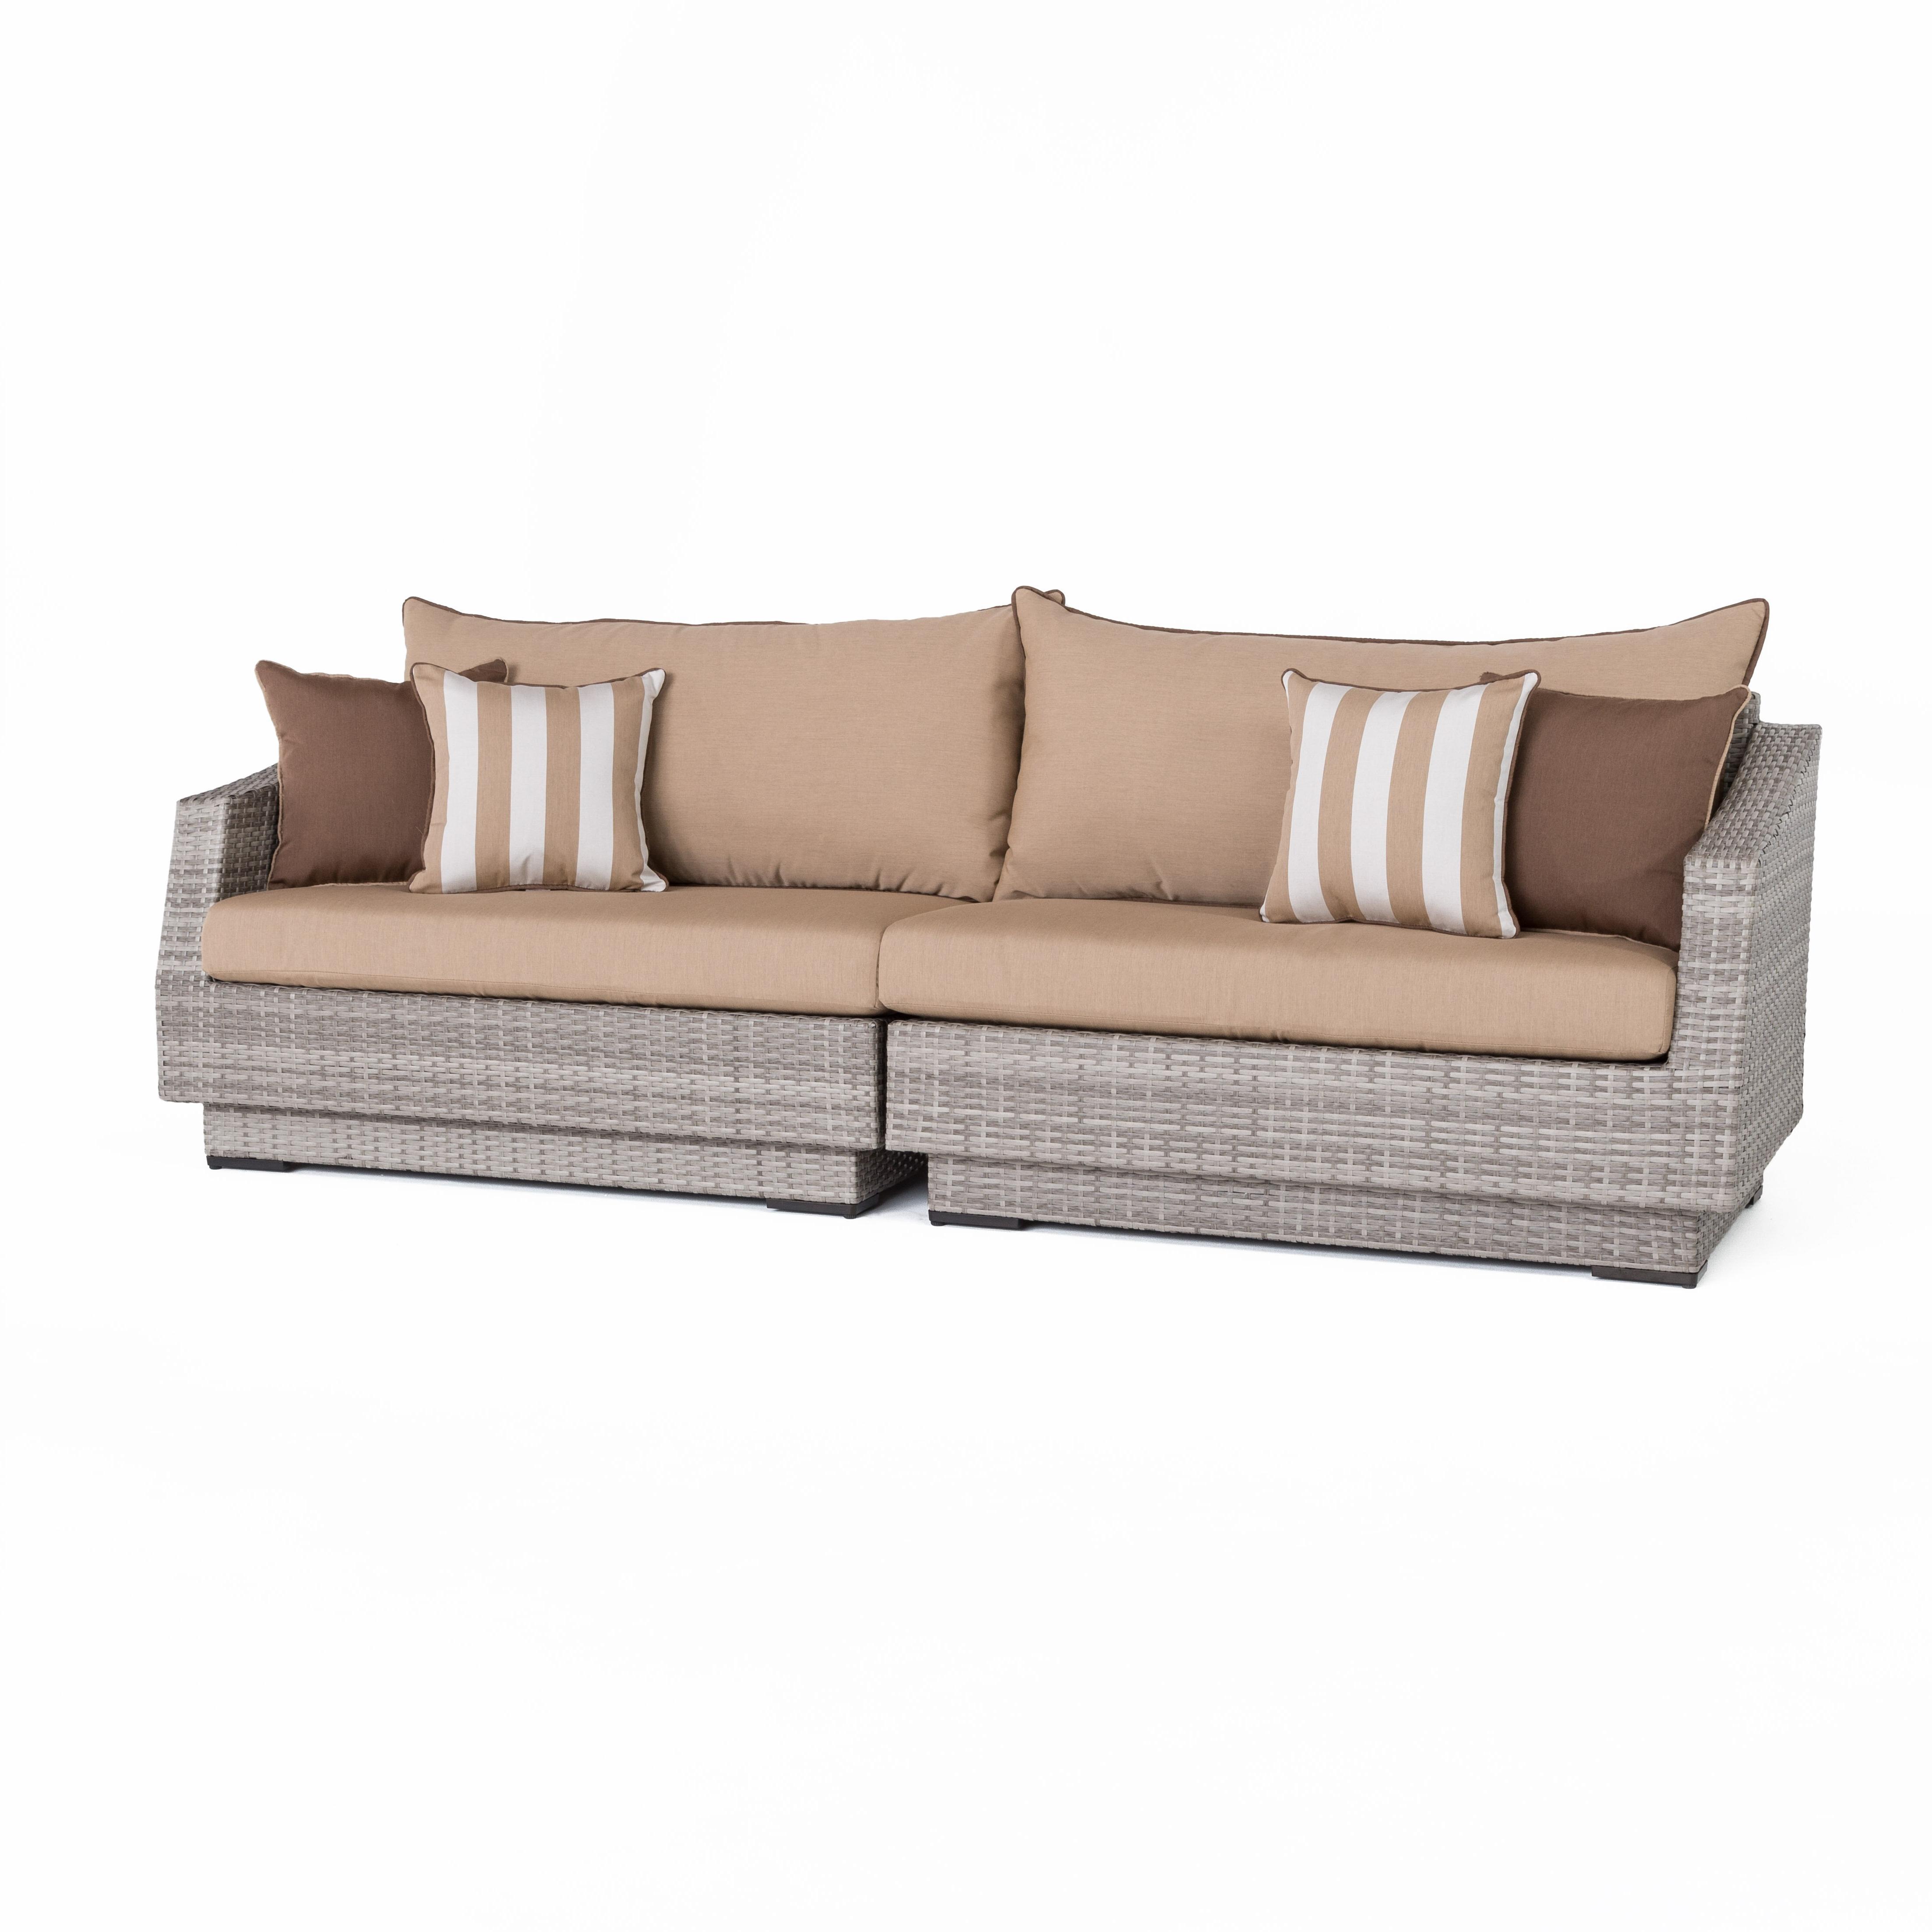 Newest Castelli Patio Sofa With Sunbrella Cushions Inside Castelli Patio Sofas With Sunbrella Cushions (View 16 of 20)